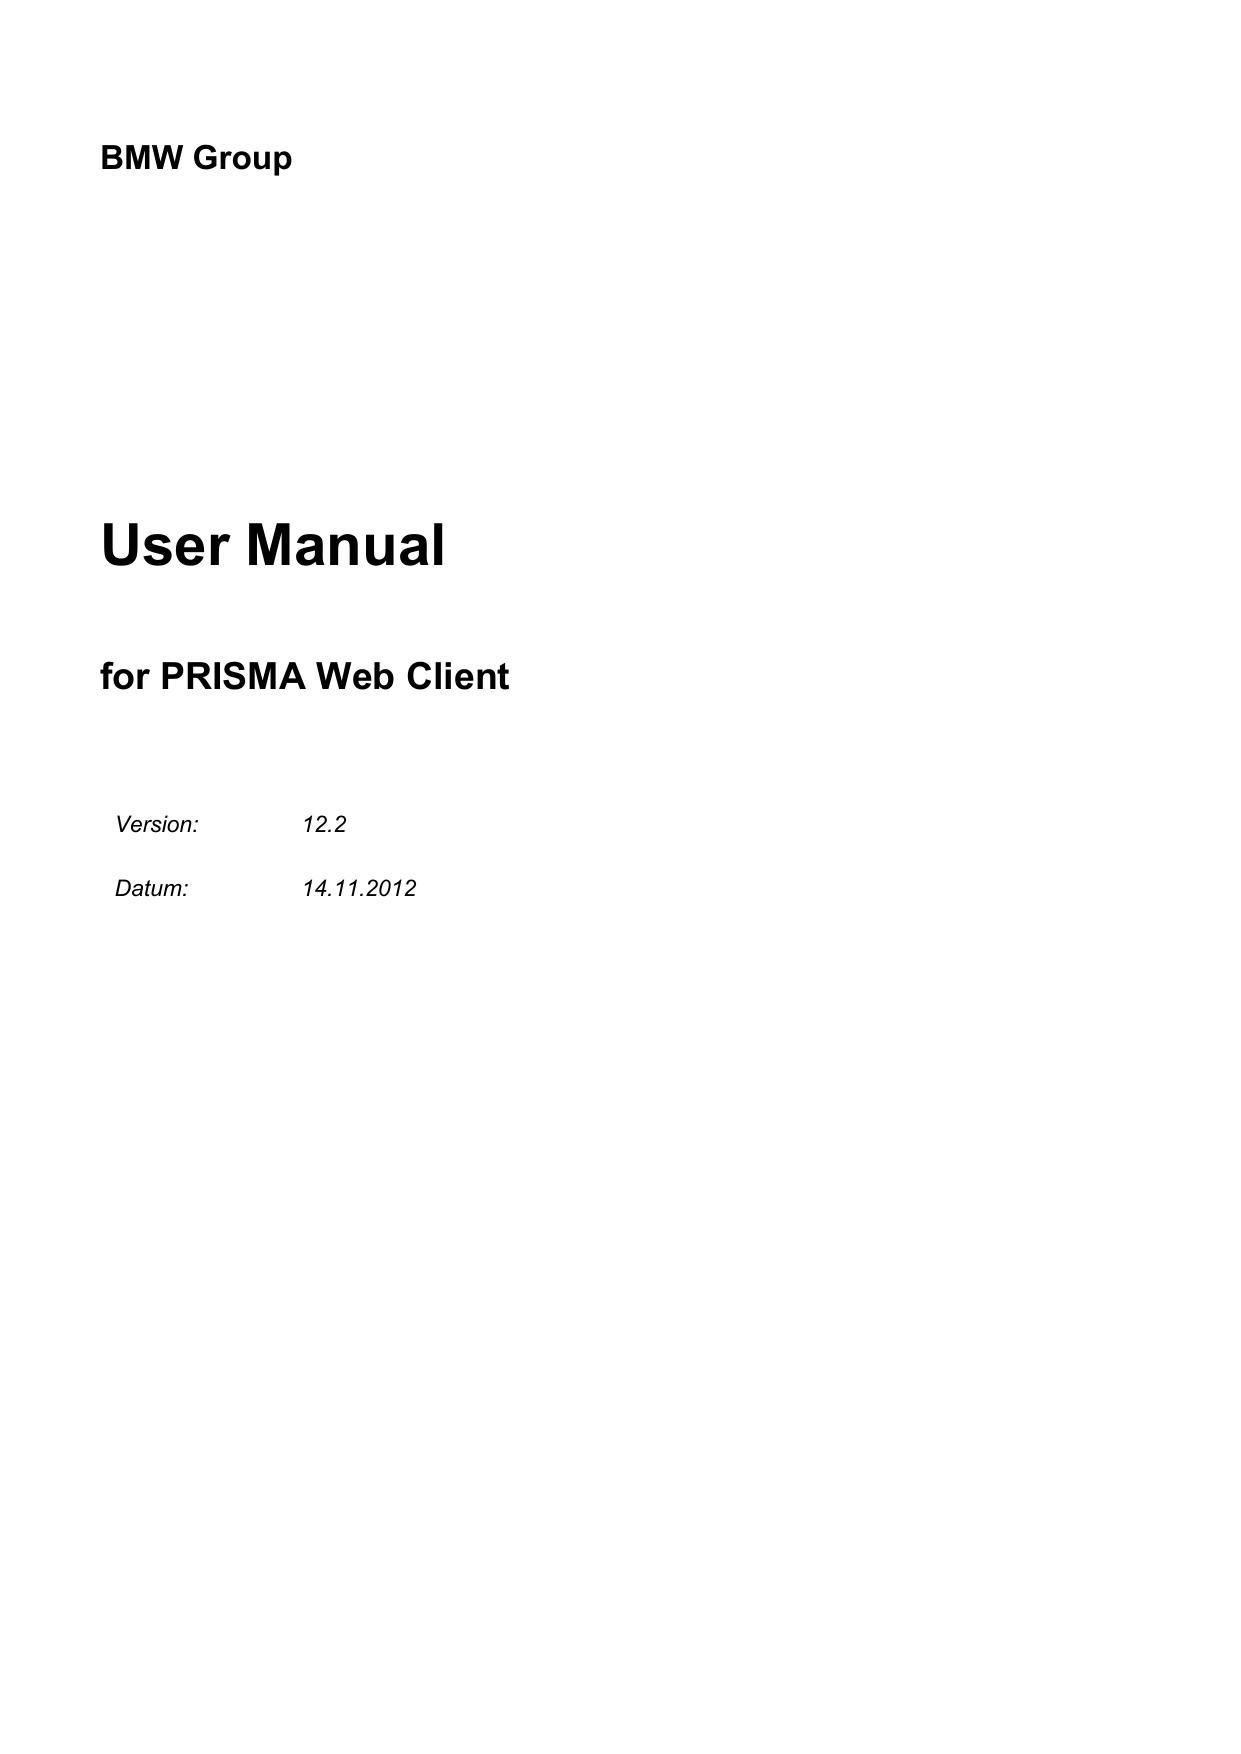 User Manual - BMW Group Partner Portal   manualzz com